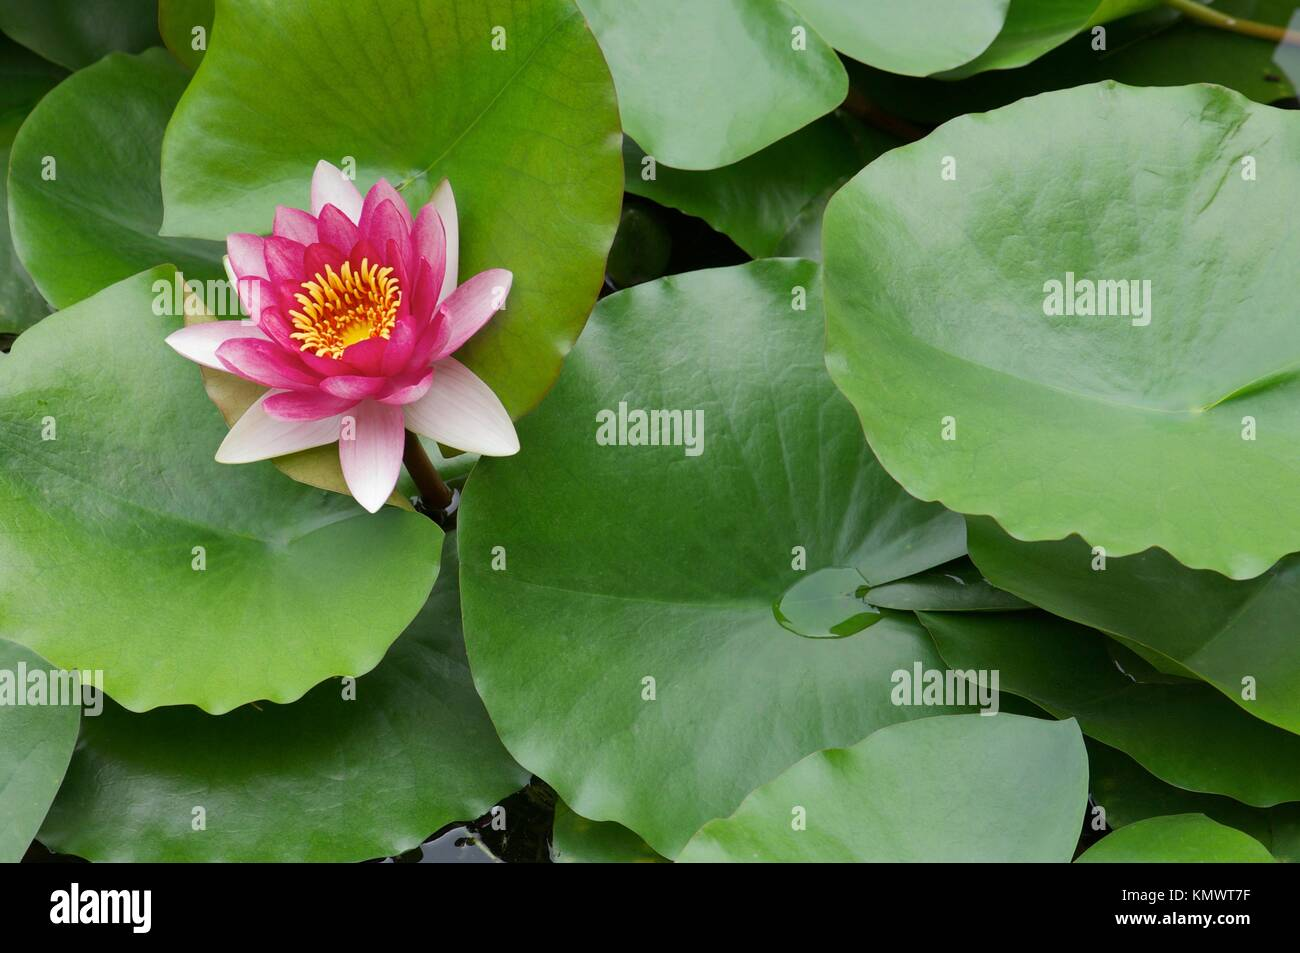 Lotus flower florist stock photos lotus flower florist stock lotus flower in the forbidden city in beijing stock image mightylinksfo